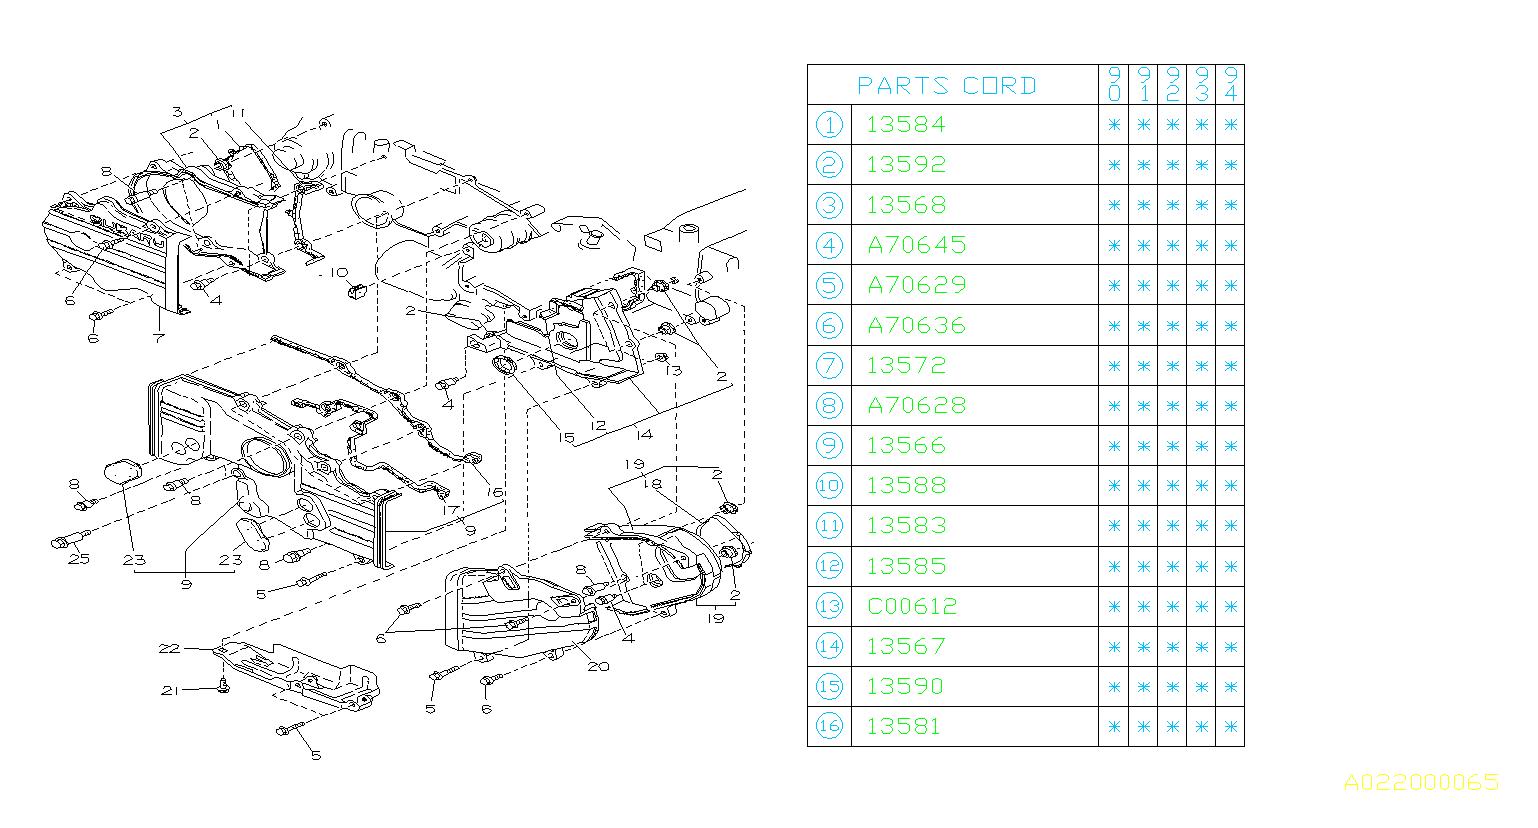 Subaru       Loyale    Sealingbelt cover  no4 left Timing